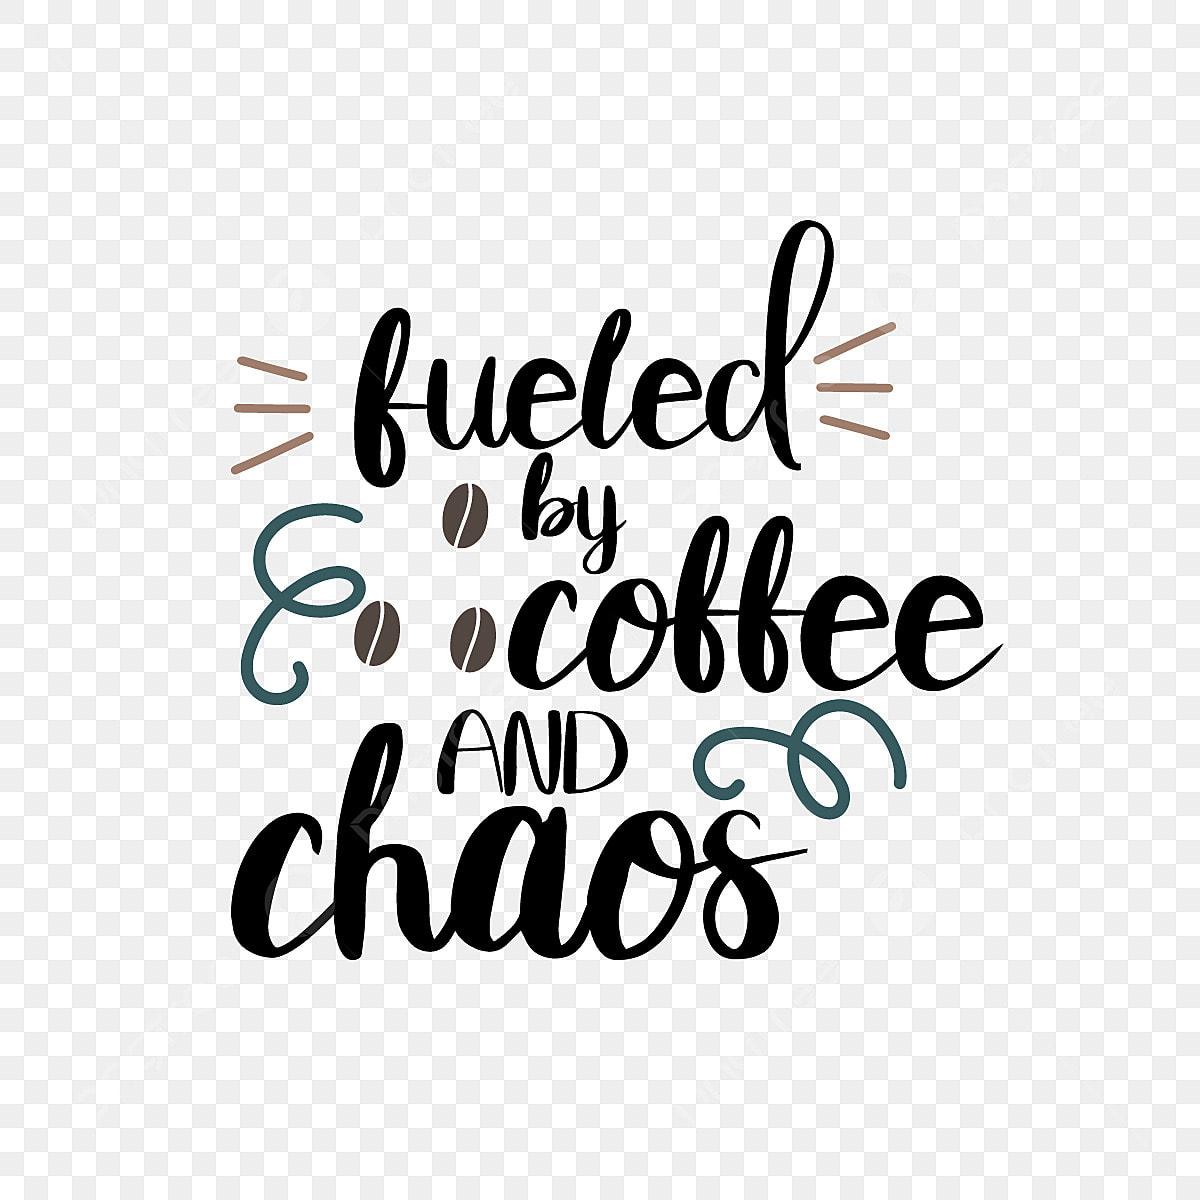 Coffee English Png المتجهات Psd قصاصة فنية تحميل مجاني Pngtree